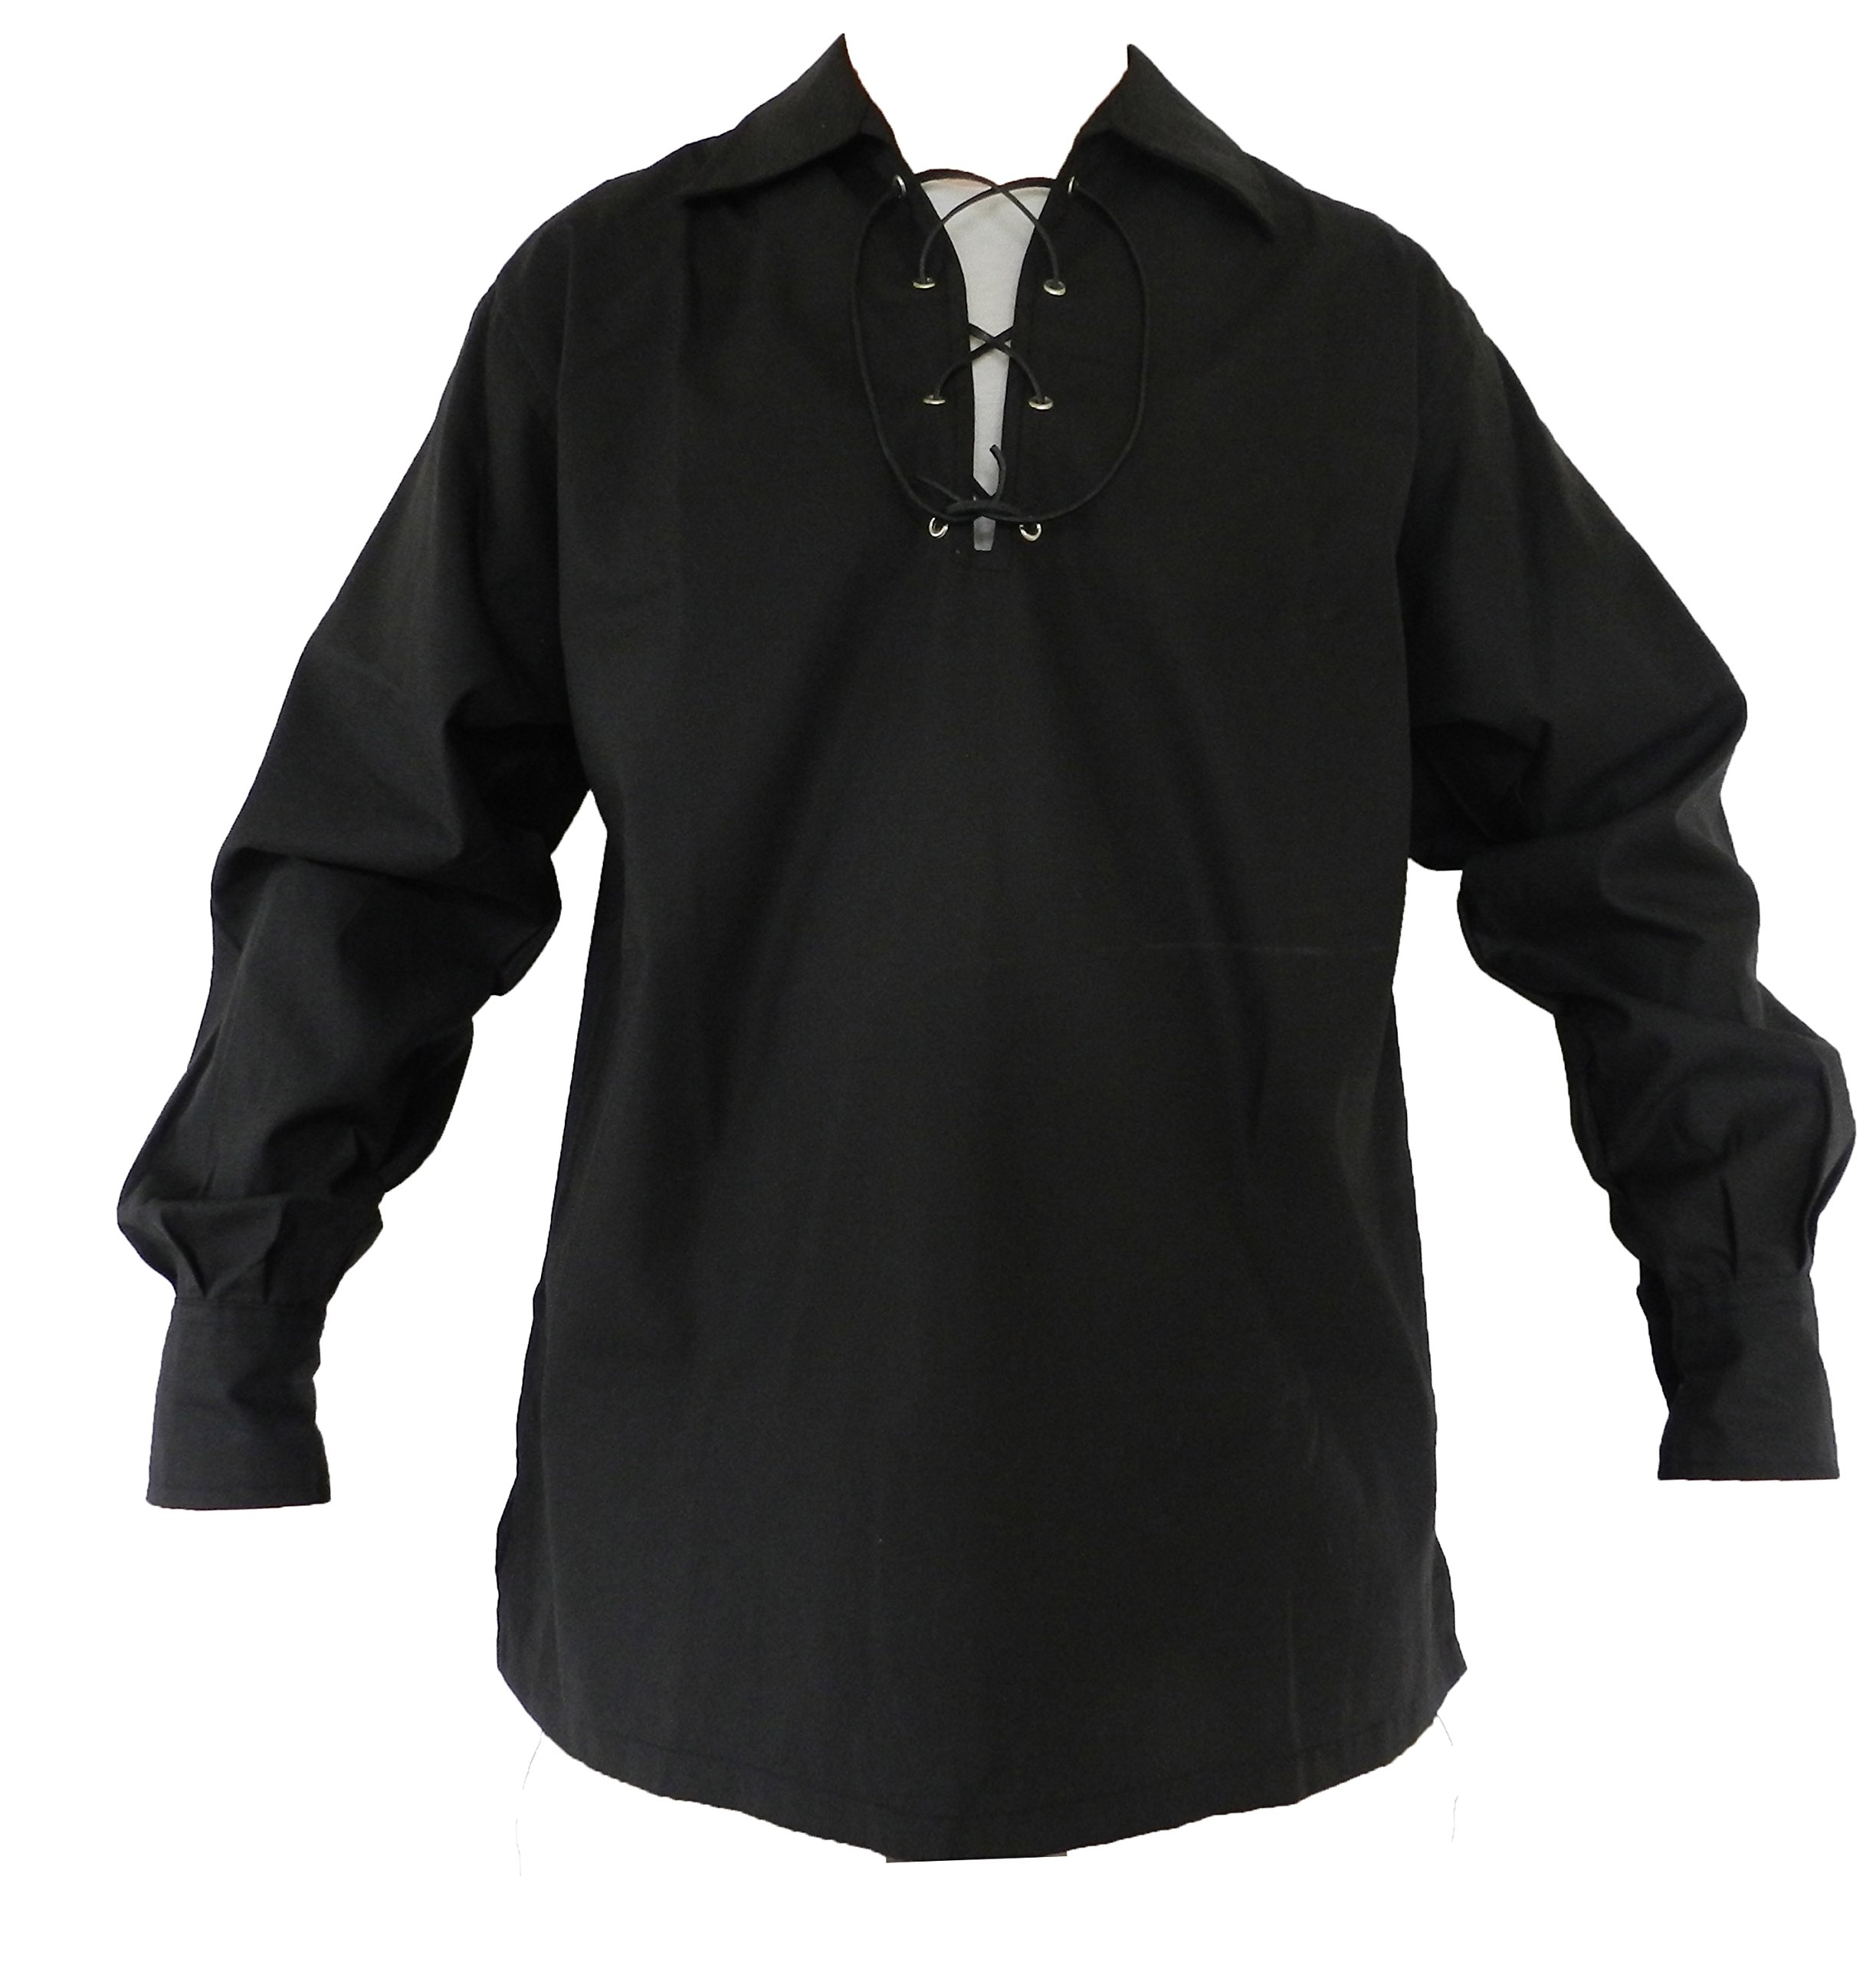 UT Kilts Jacobite Ghillie Shirt Black Large